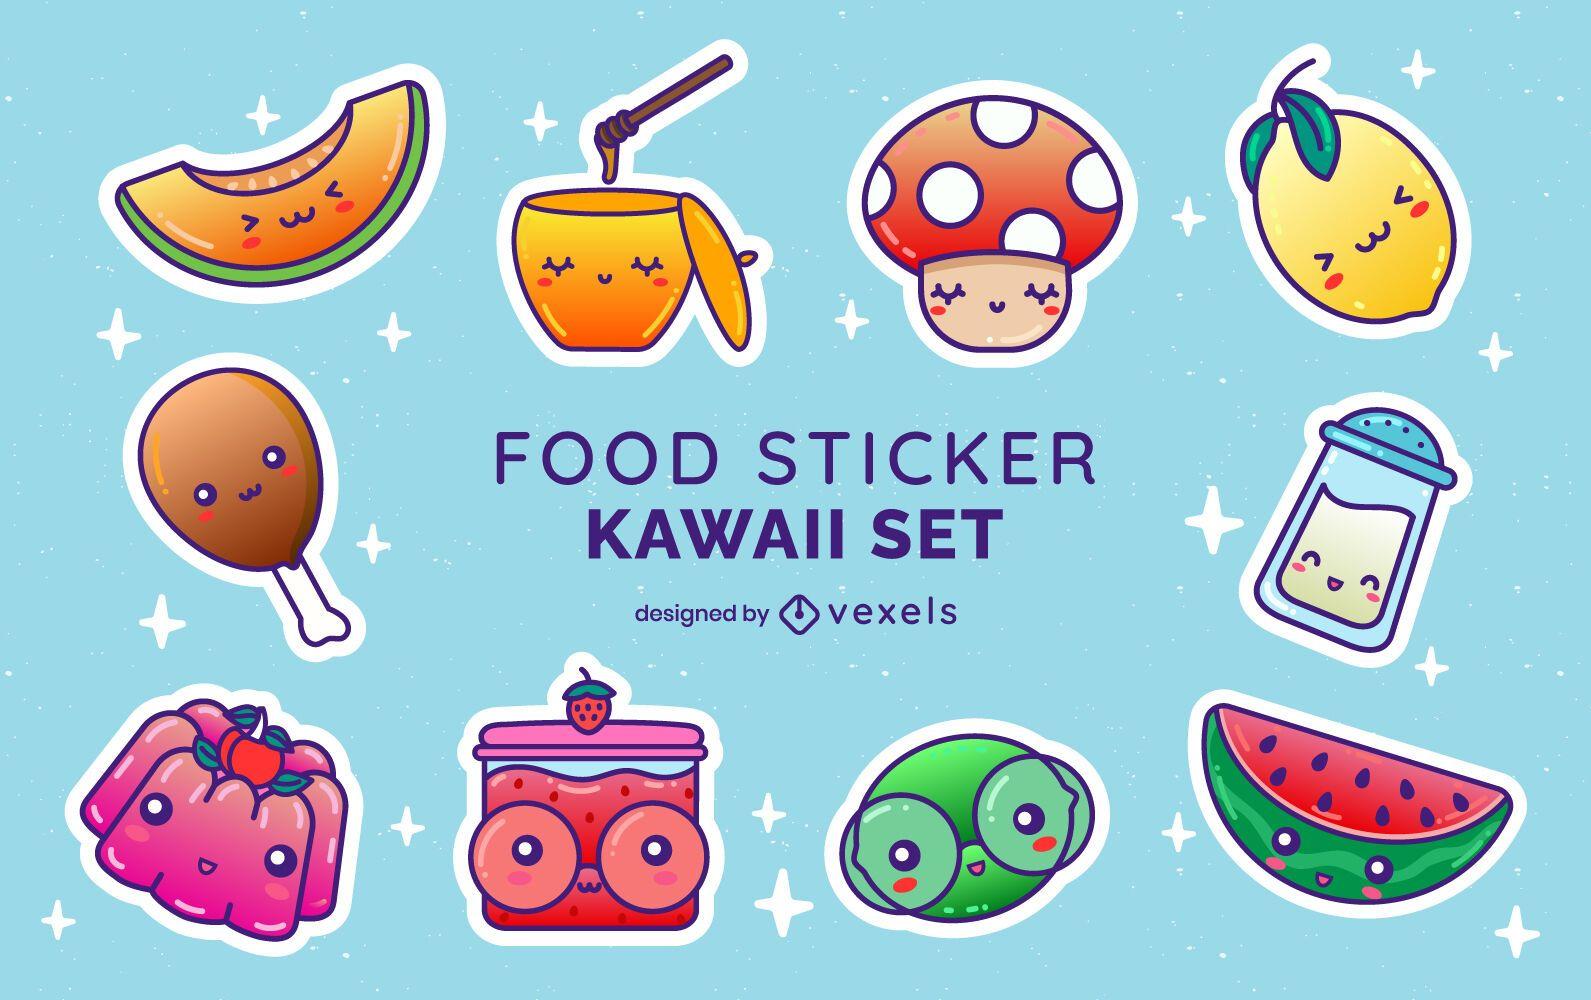 Food sticker kawaii set